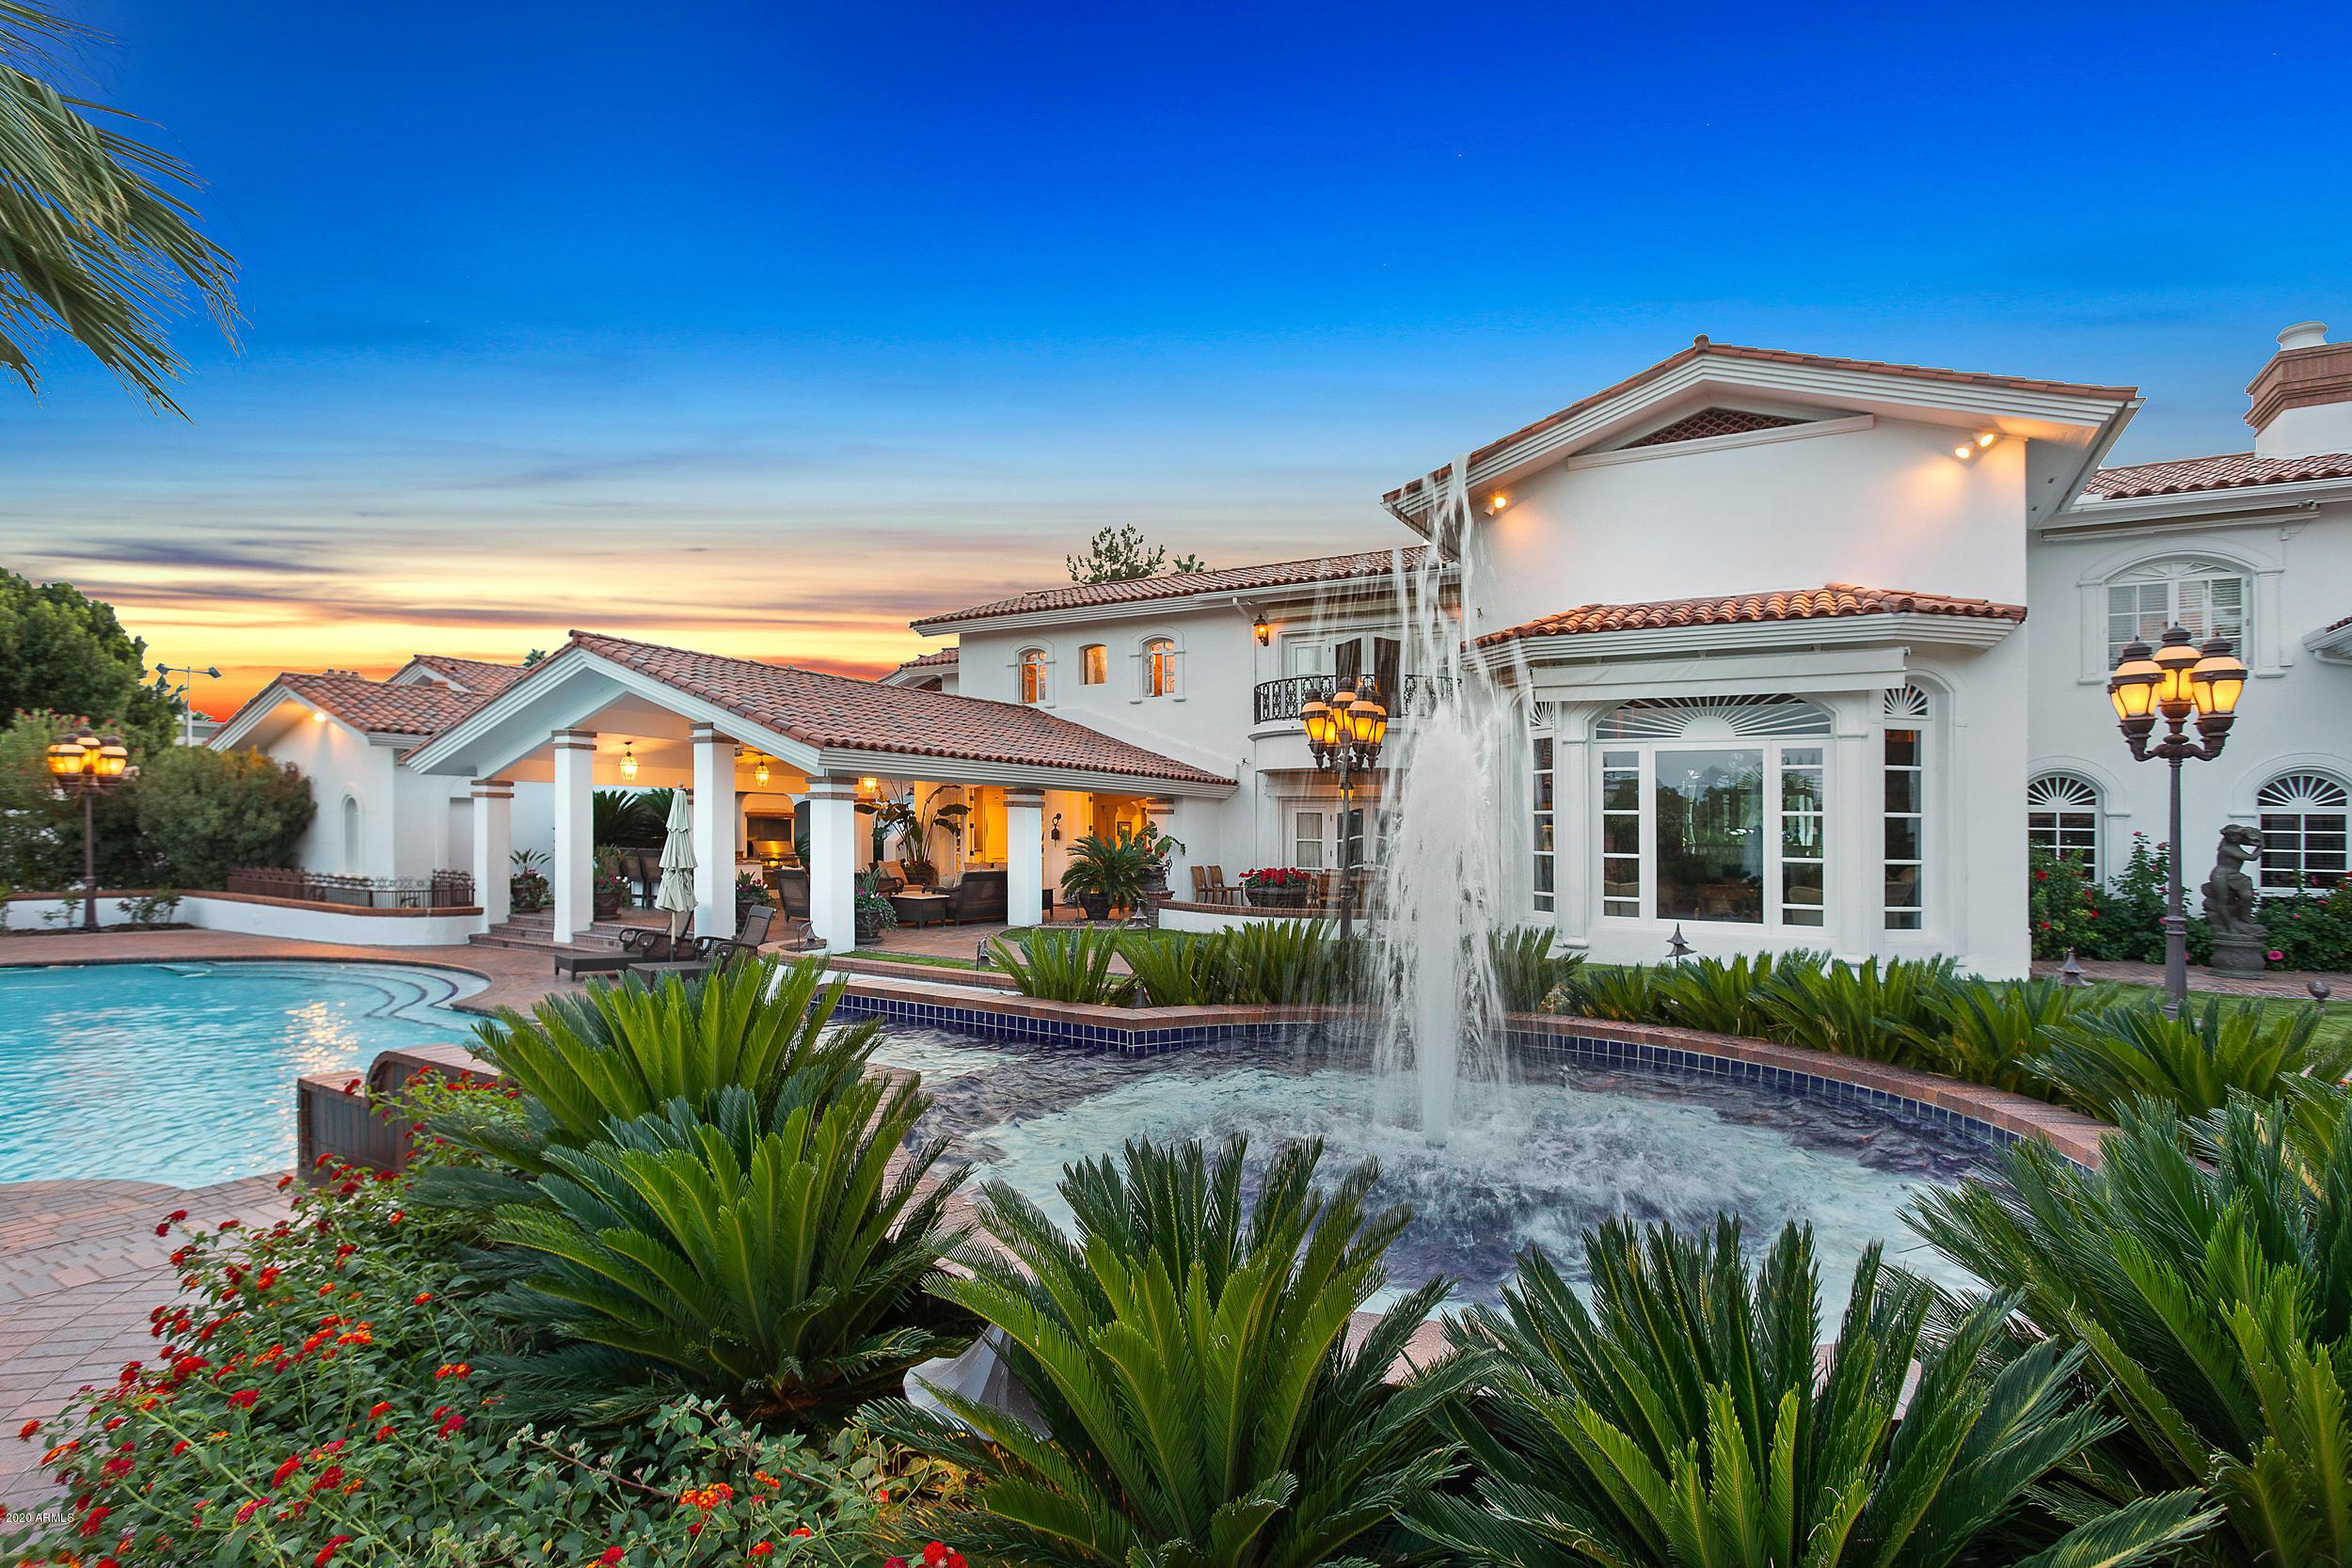 37 Biltmore Estate Phoenix, AZ 85016